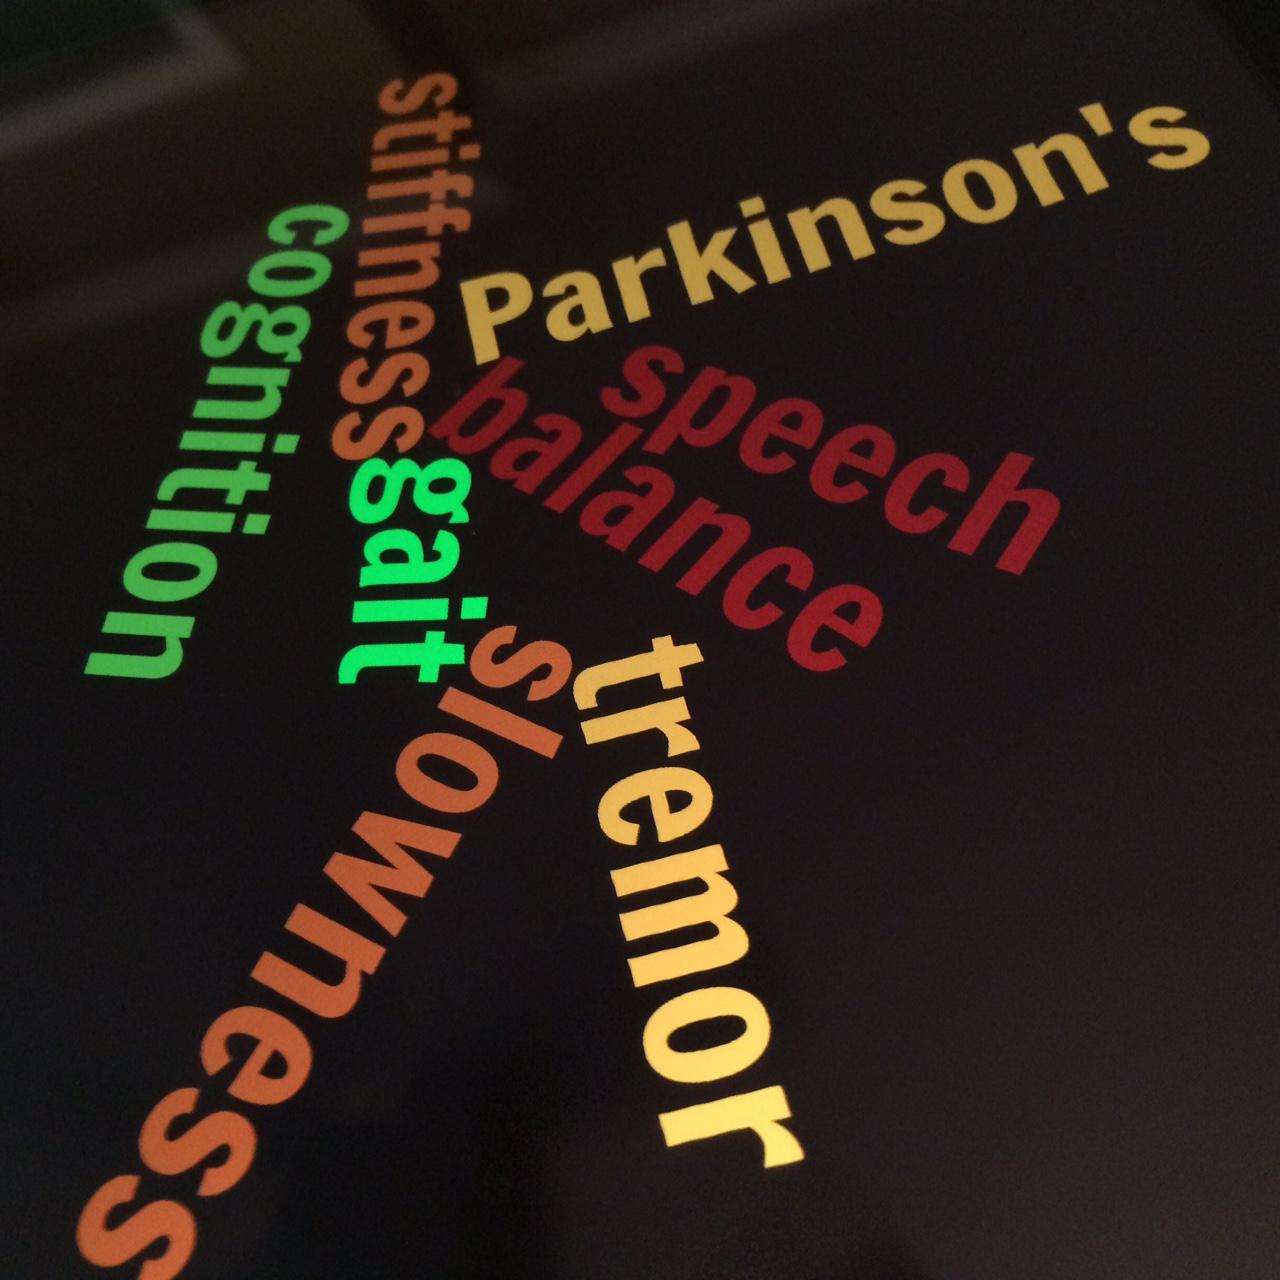 Parkinson's word art!